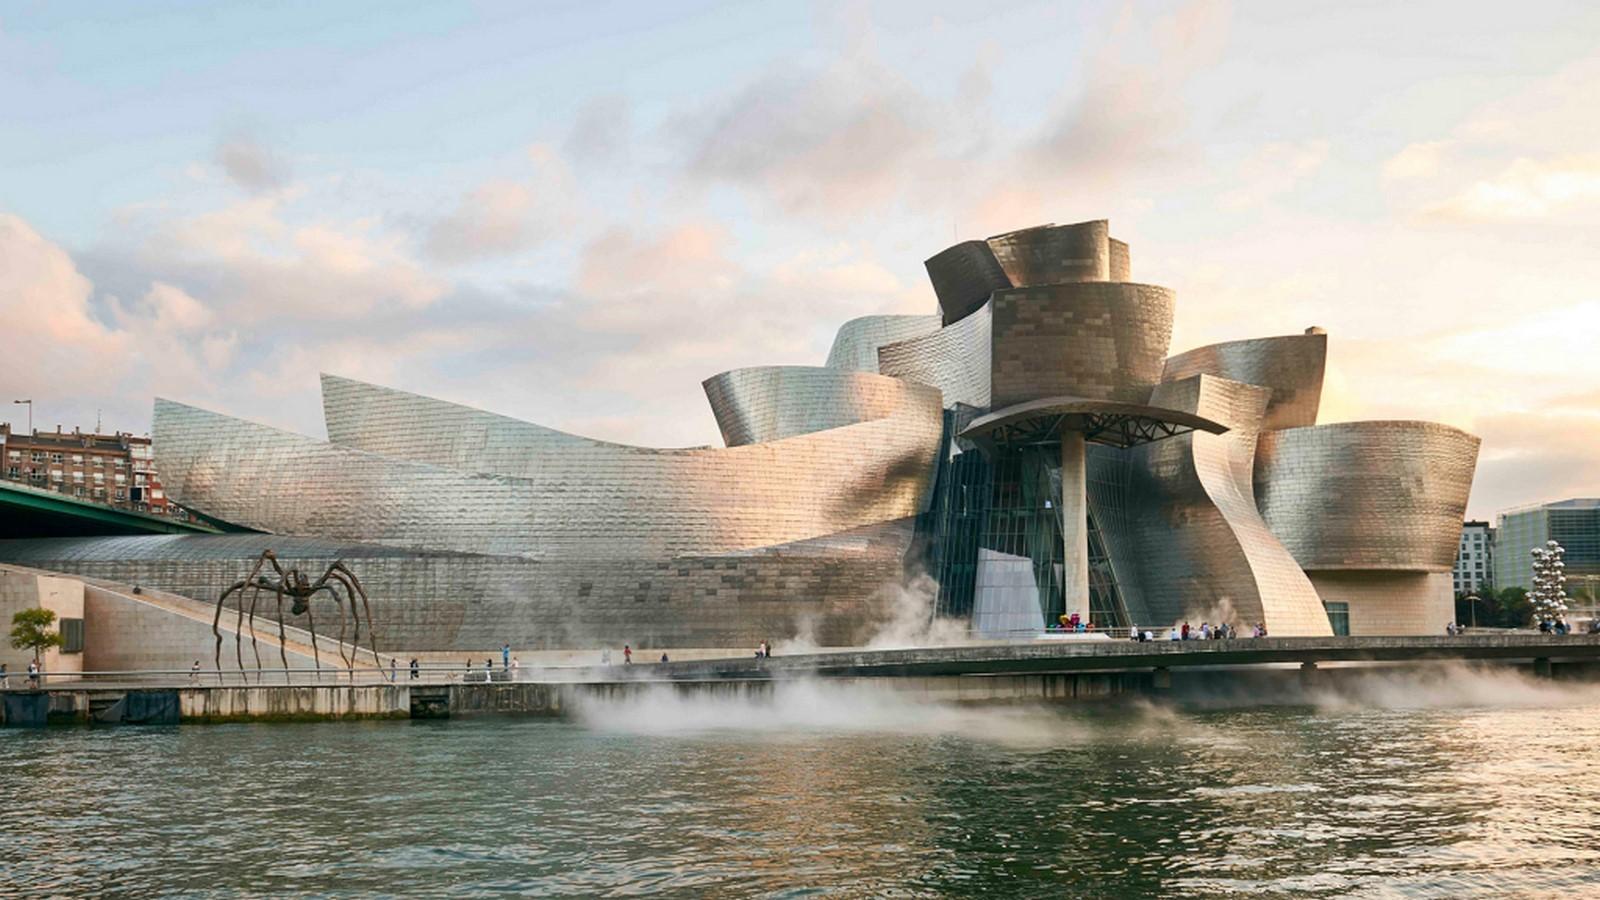 Guggenheim Bilbao (Bilbao, Spain) - Sheet1